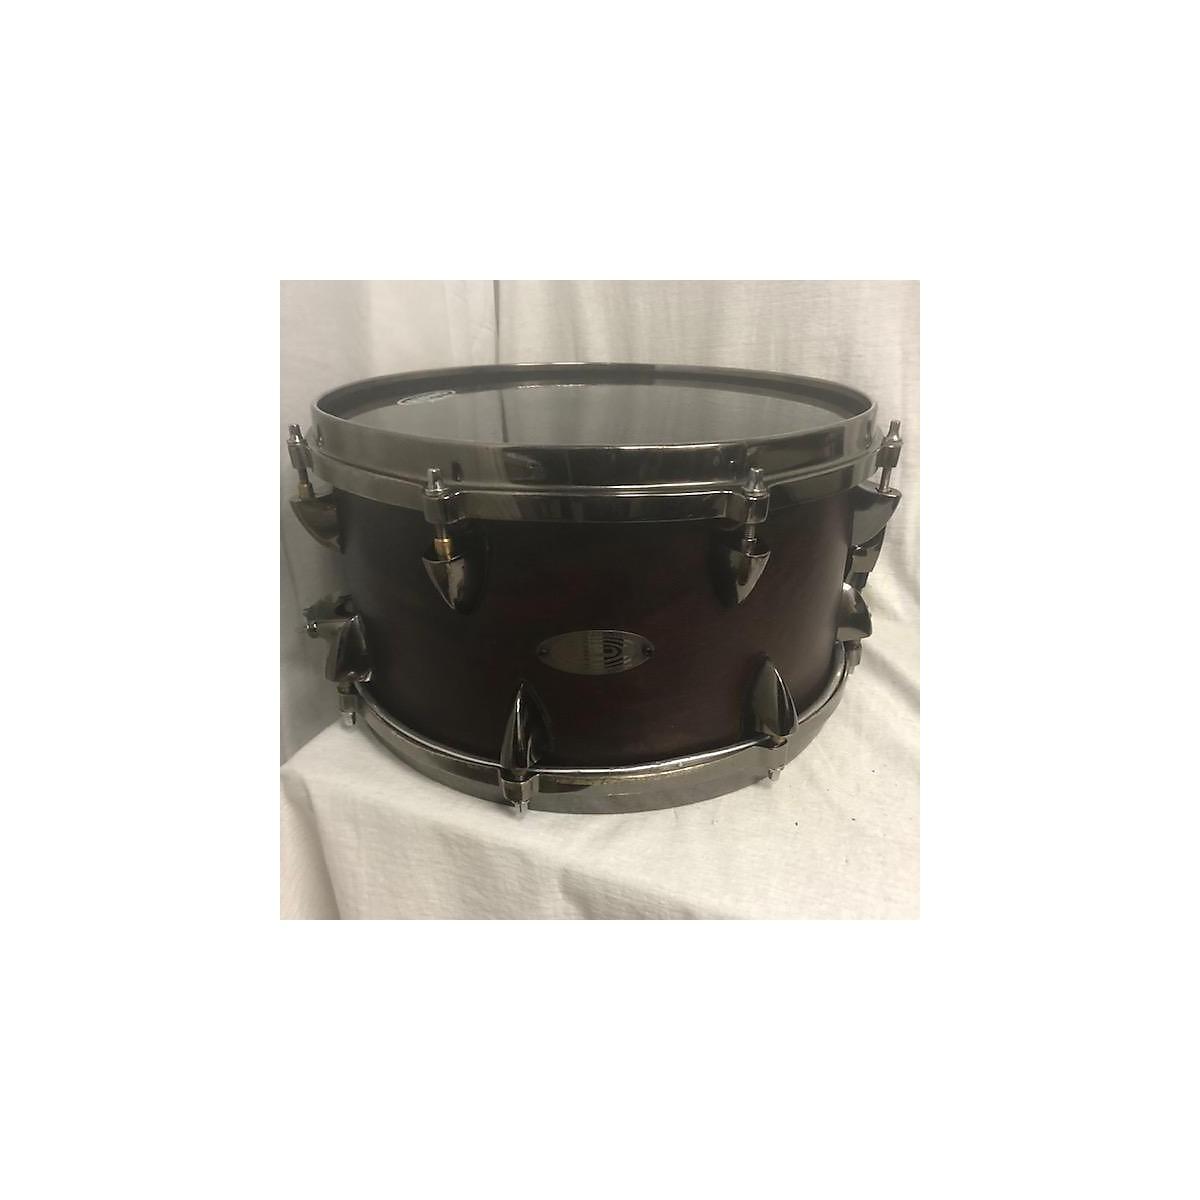 Orange County Drum & Percussion 13X7 Mahogany Snare Drum